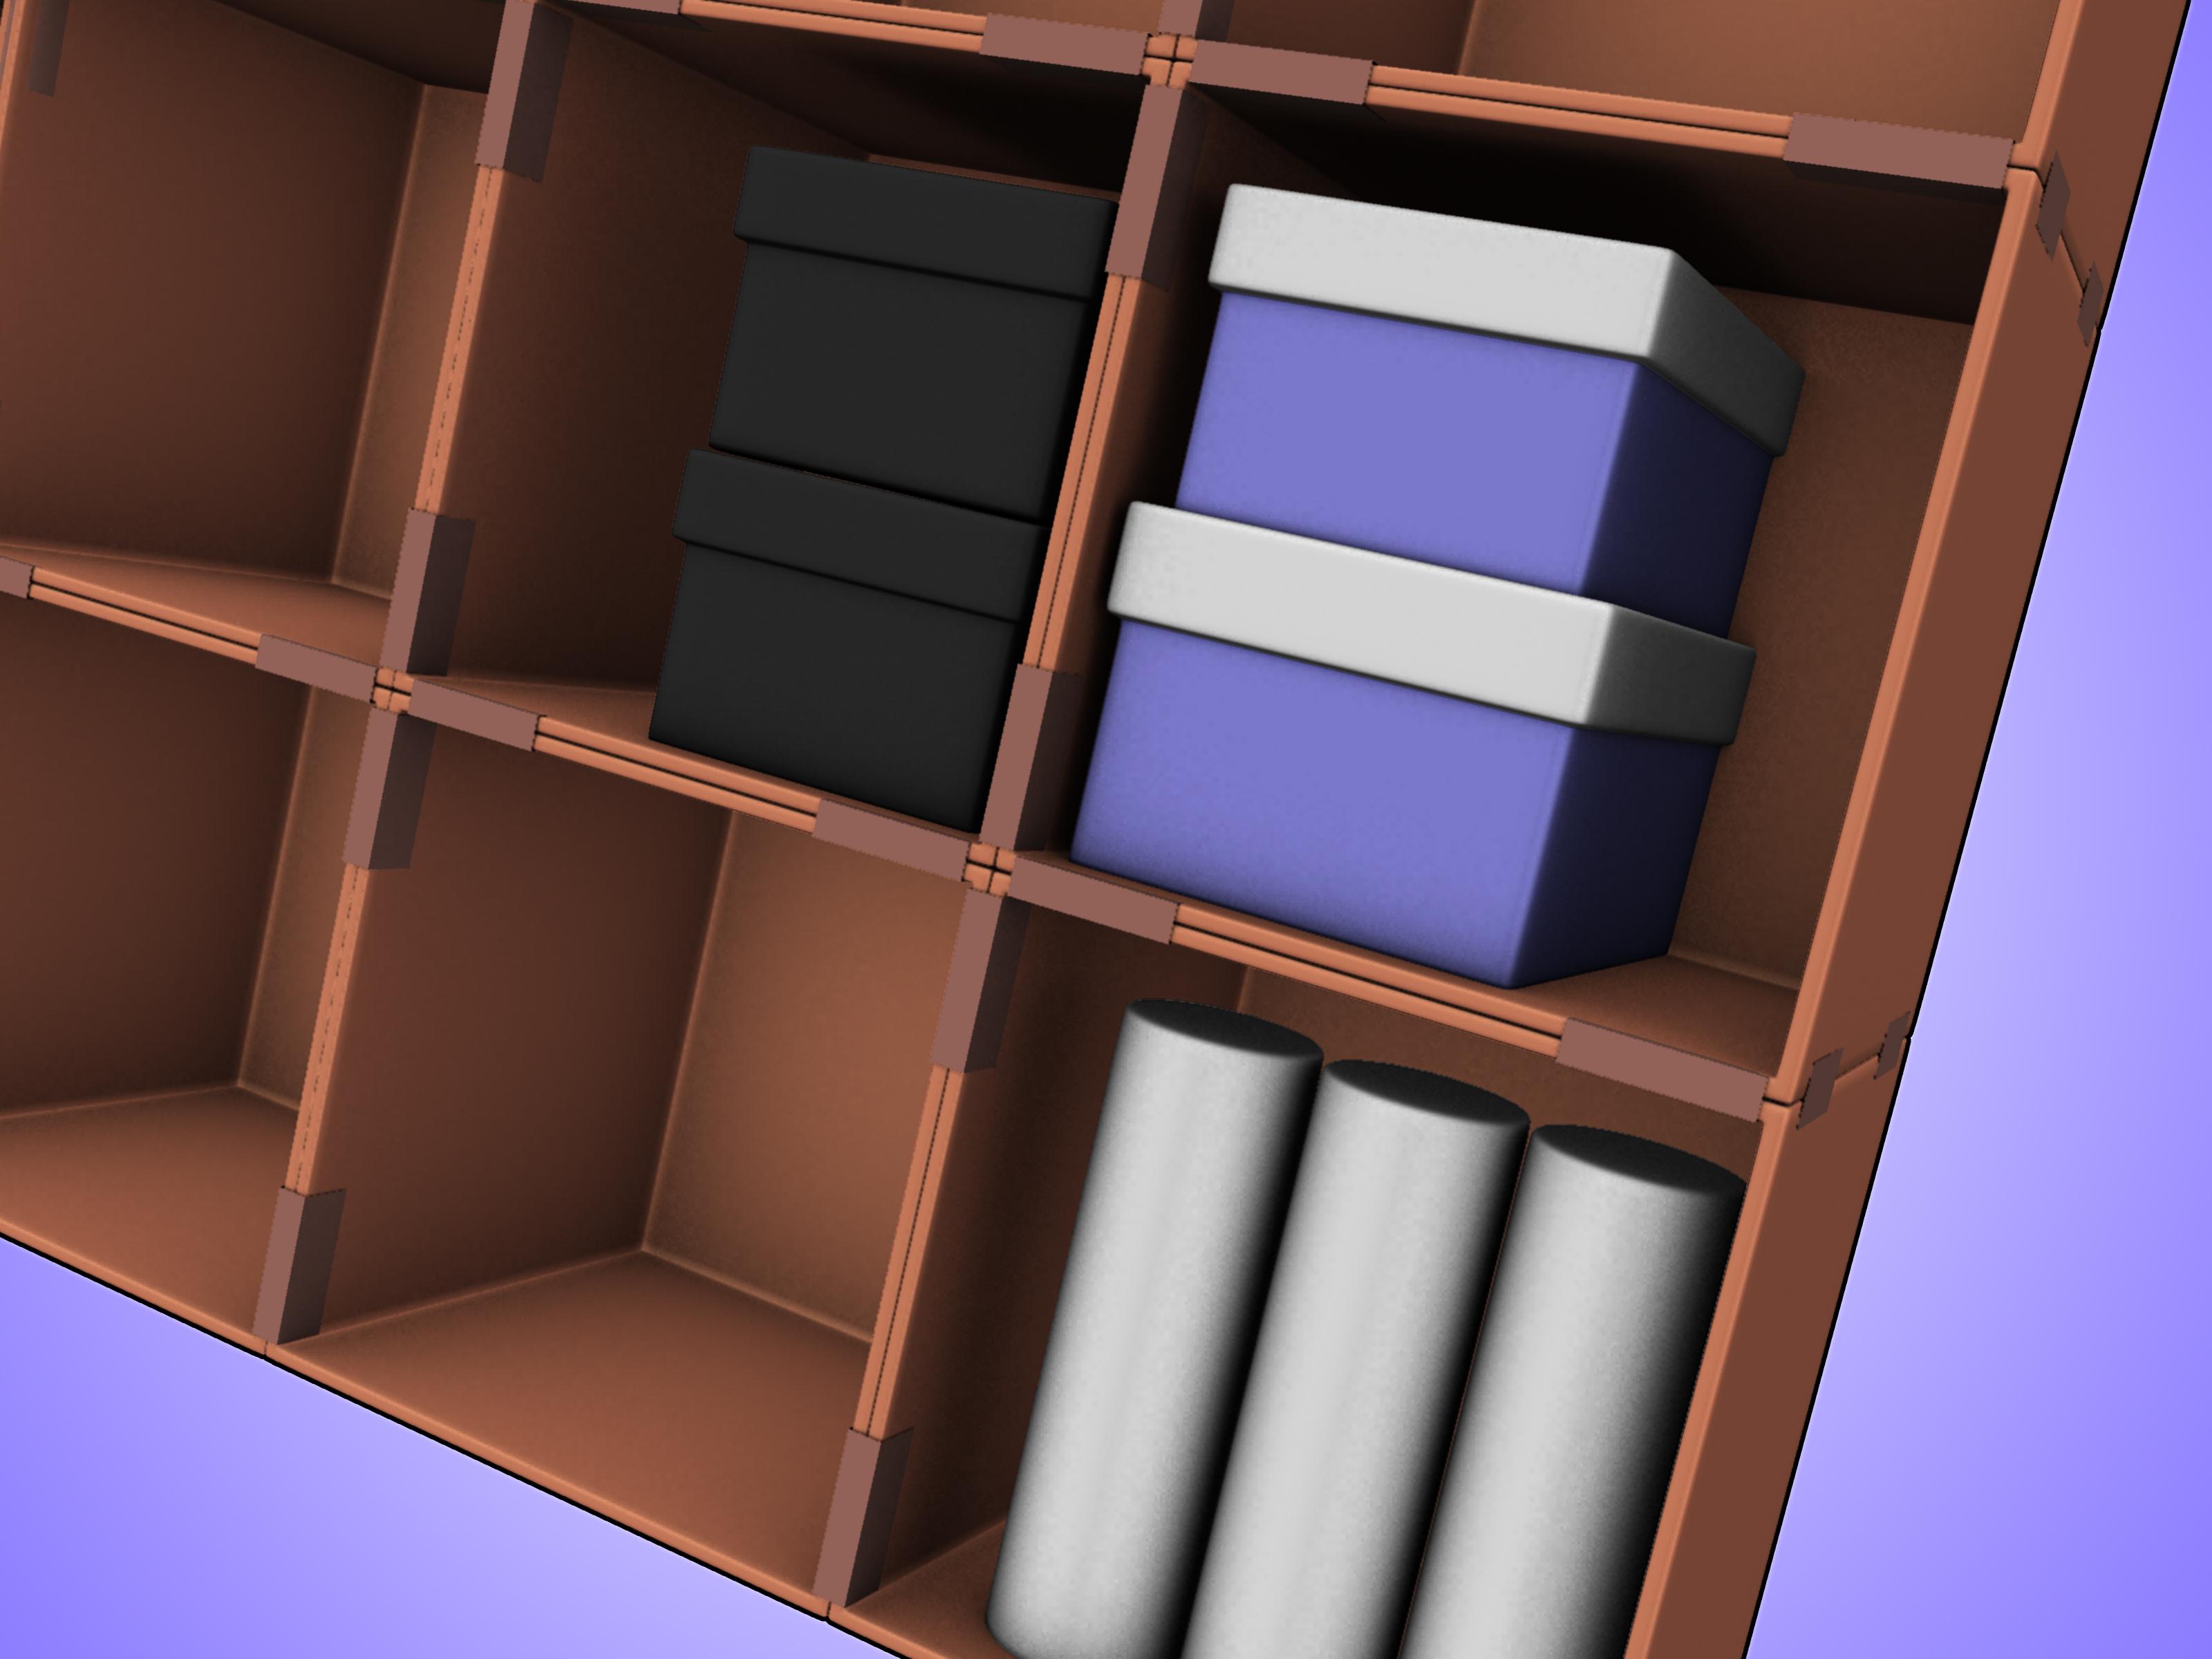 how to make a cardboard box storage system: 4 steps